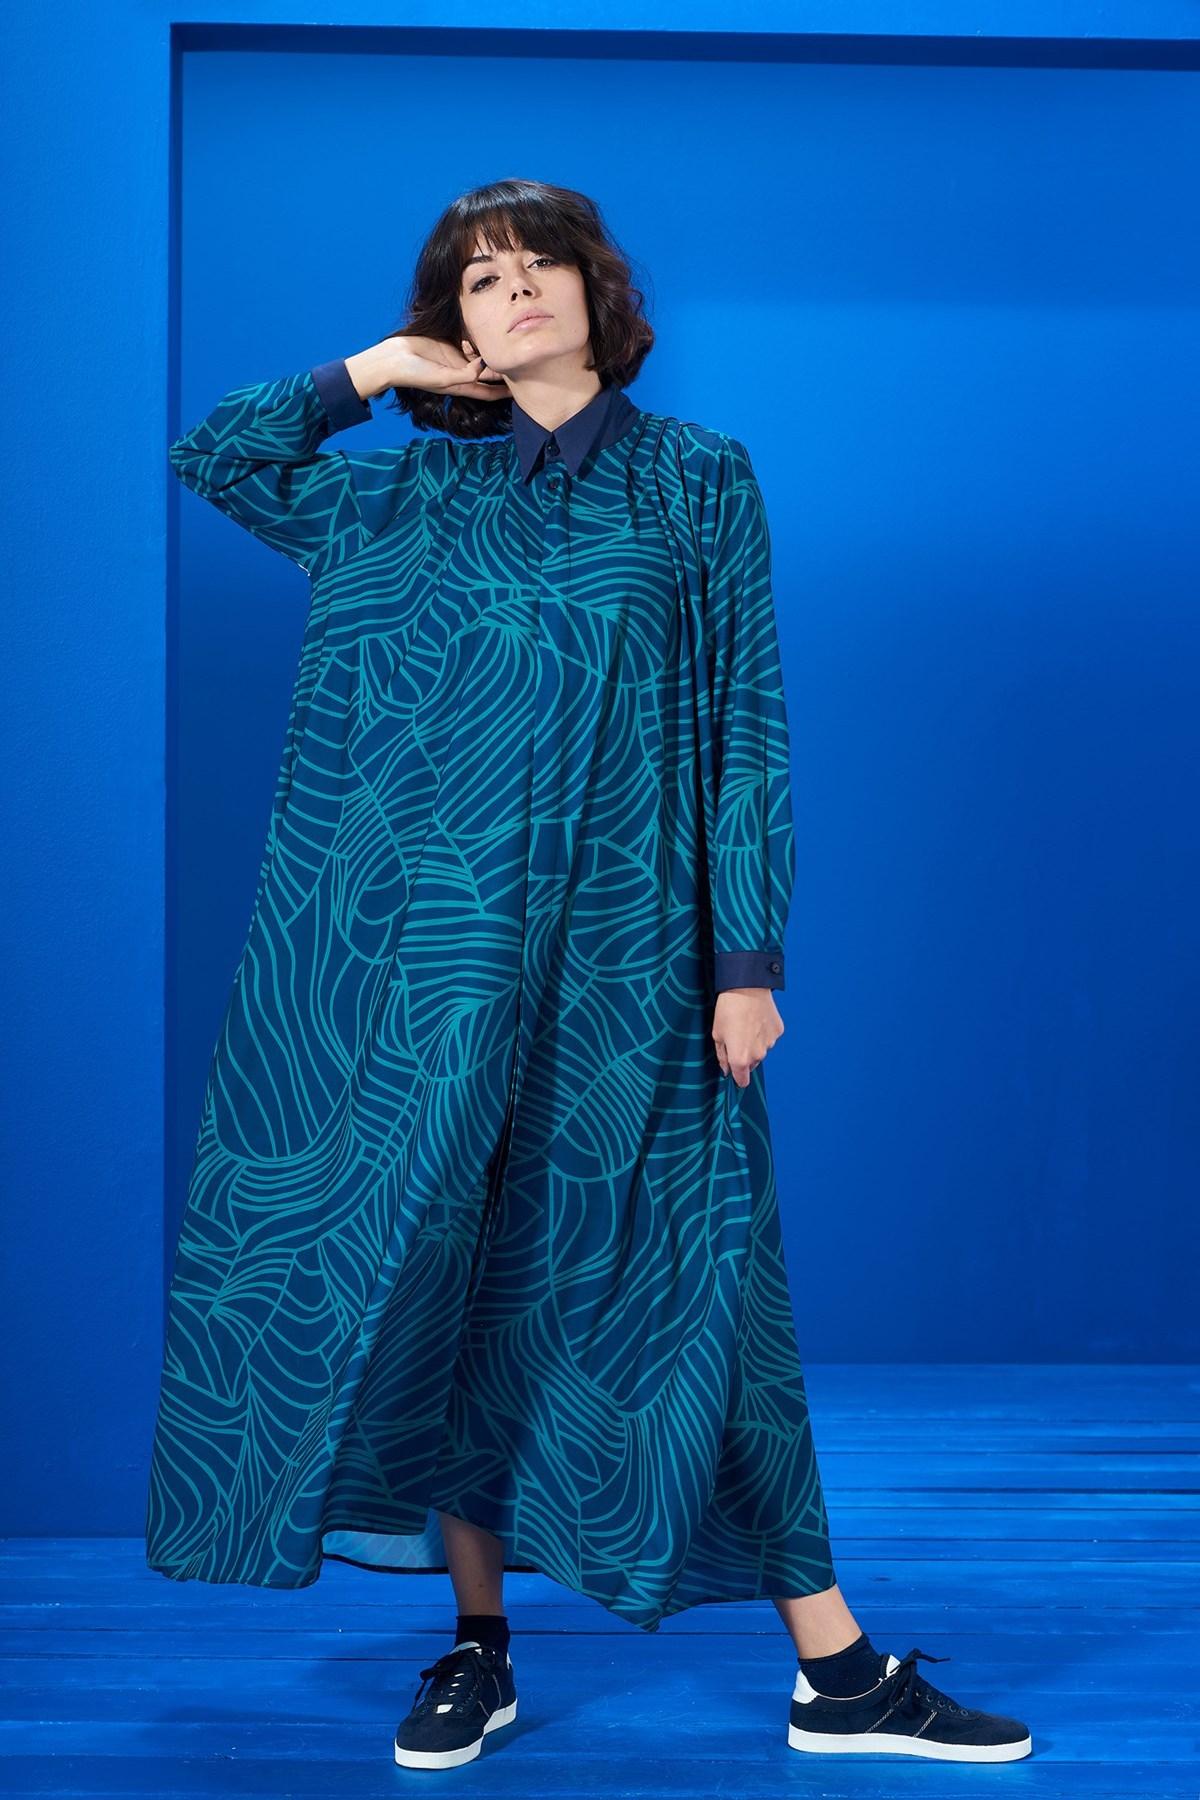 Mevra - Yaka Detay Elbise Desenli Laci-Yeşil